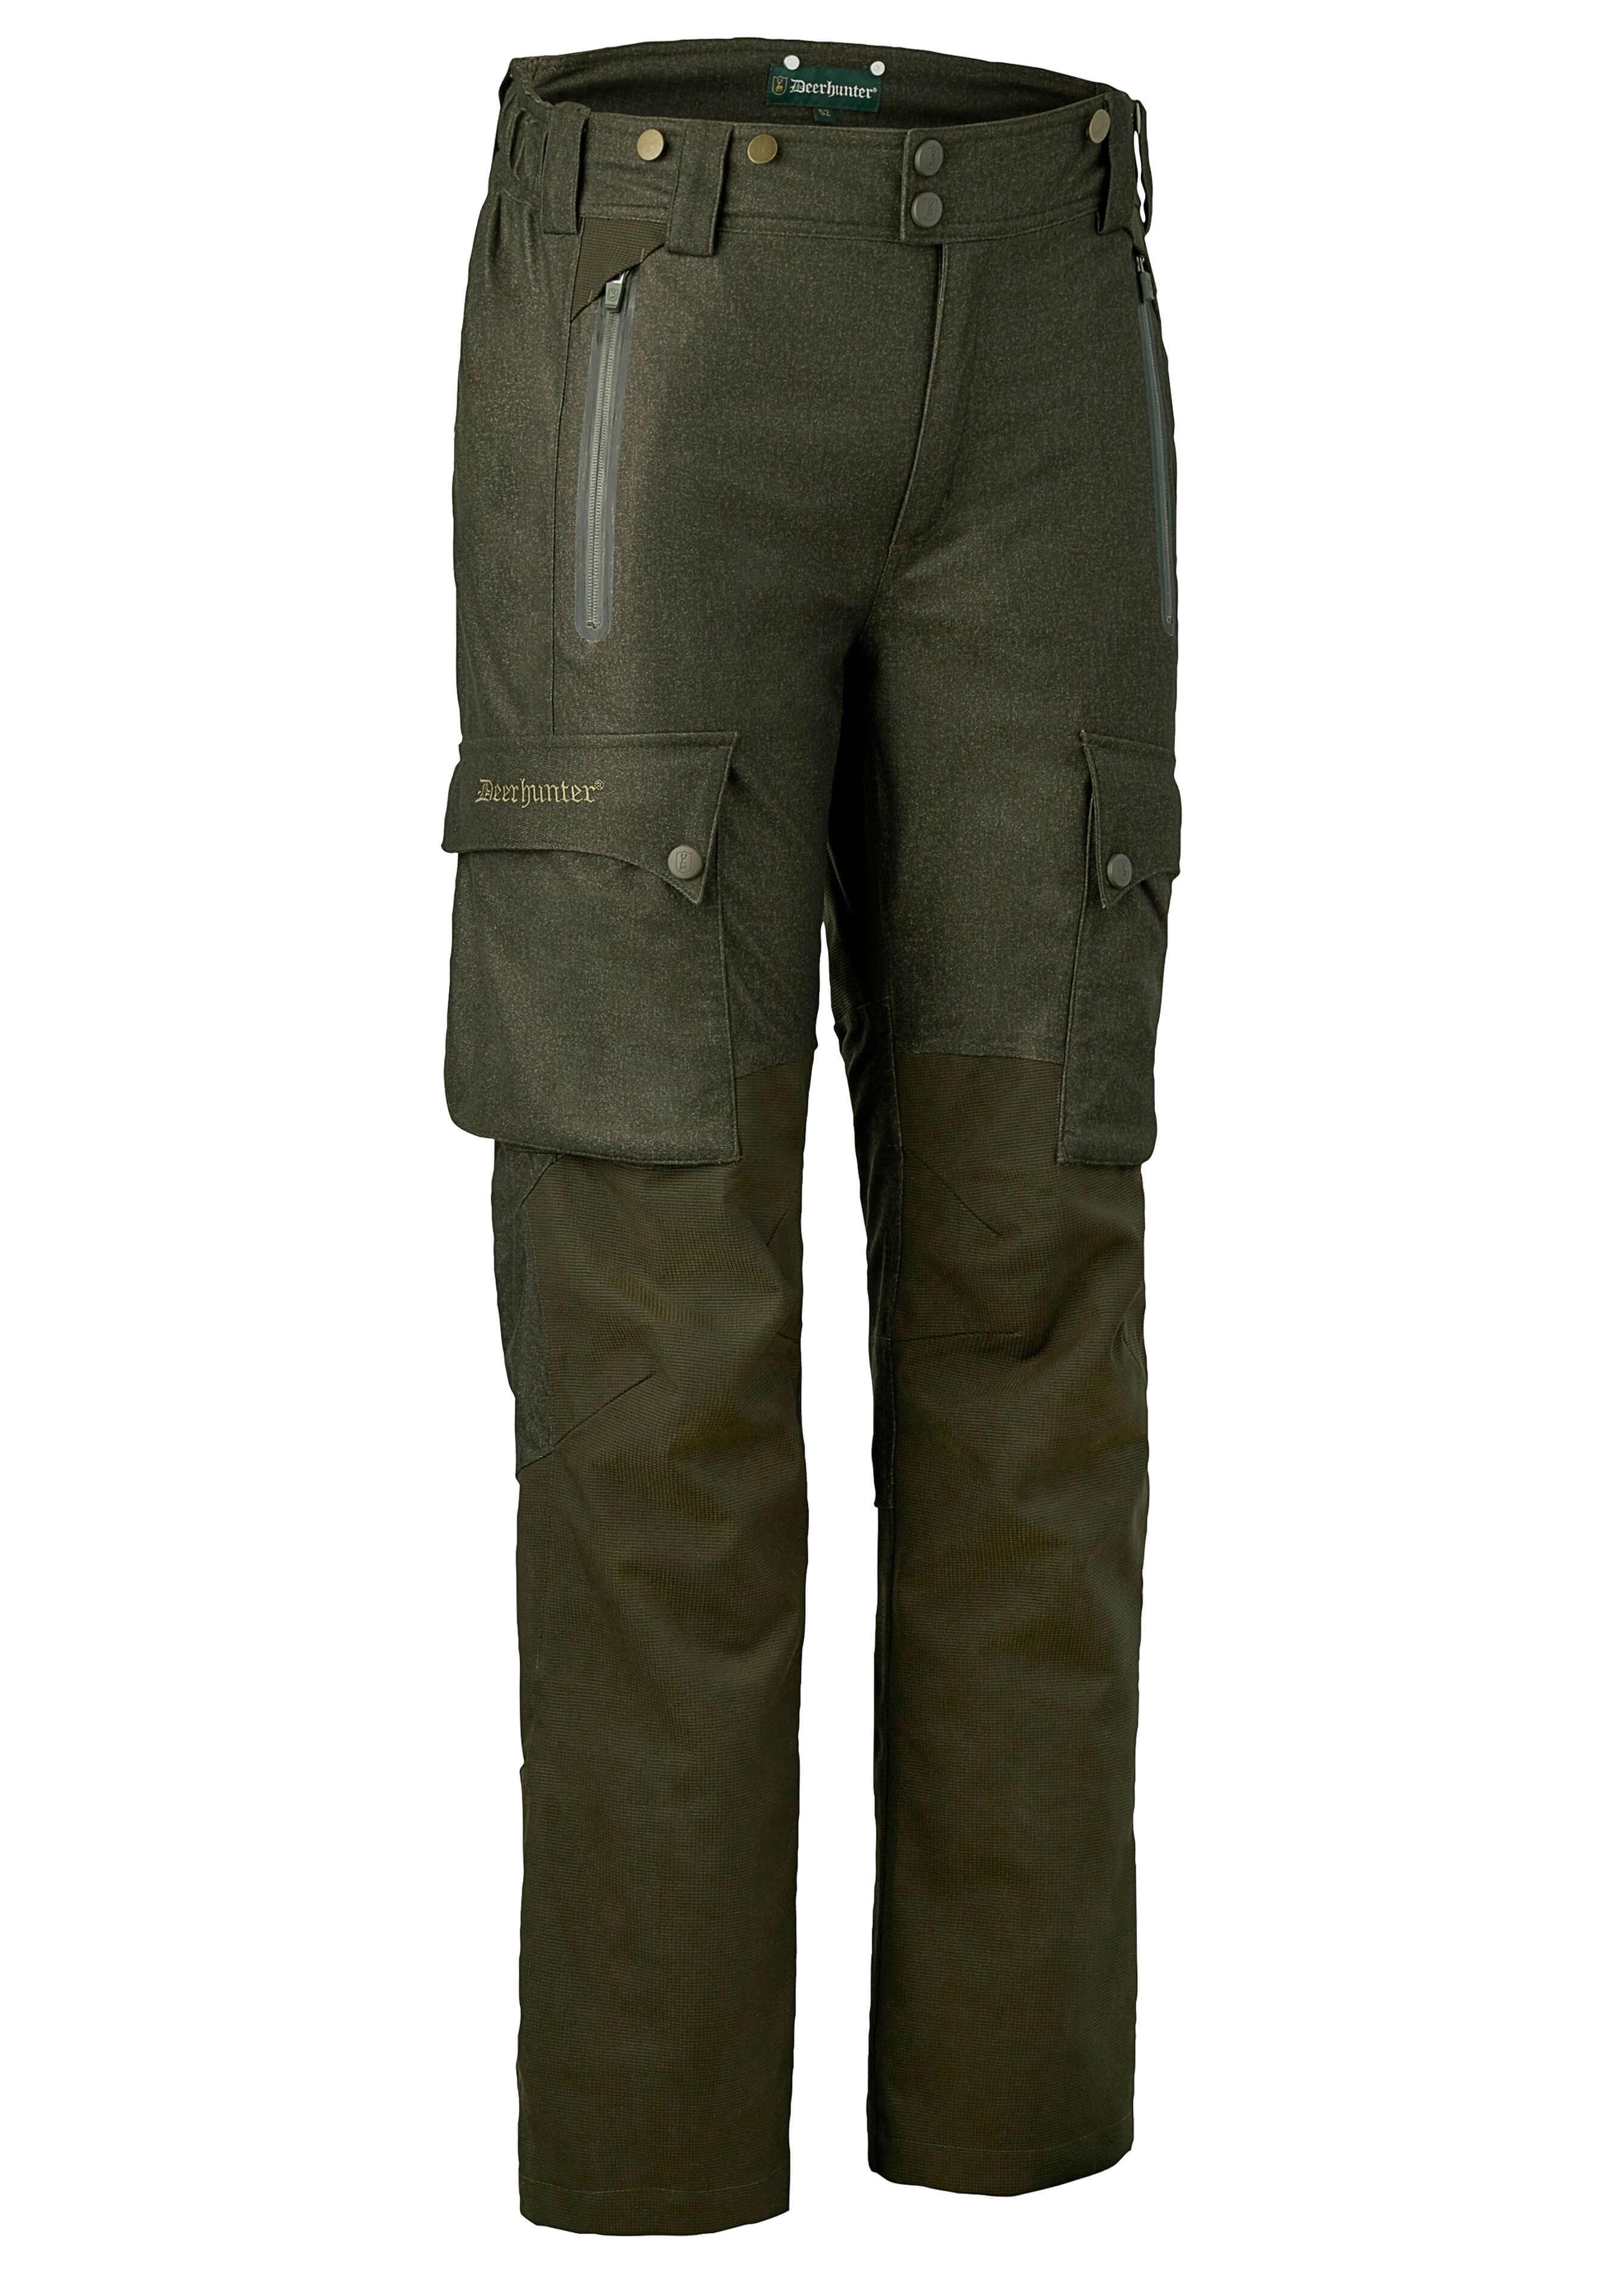 Deerhunter Stretch-Jagdhose Ram 26112442 1